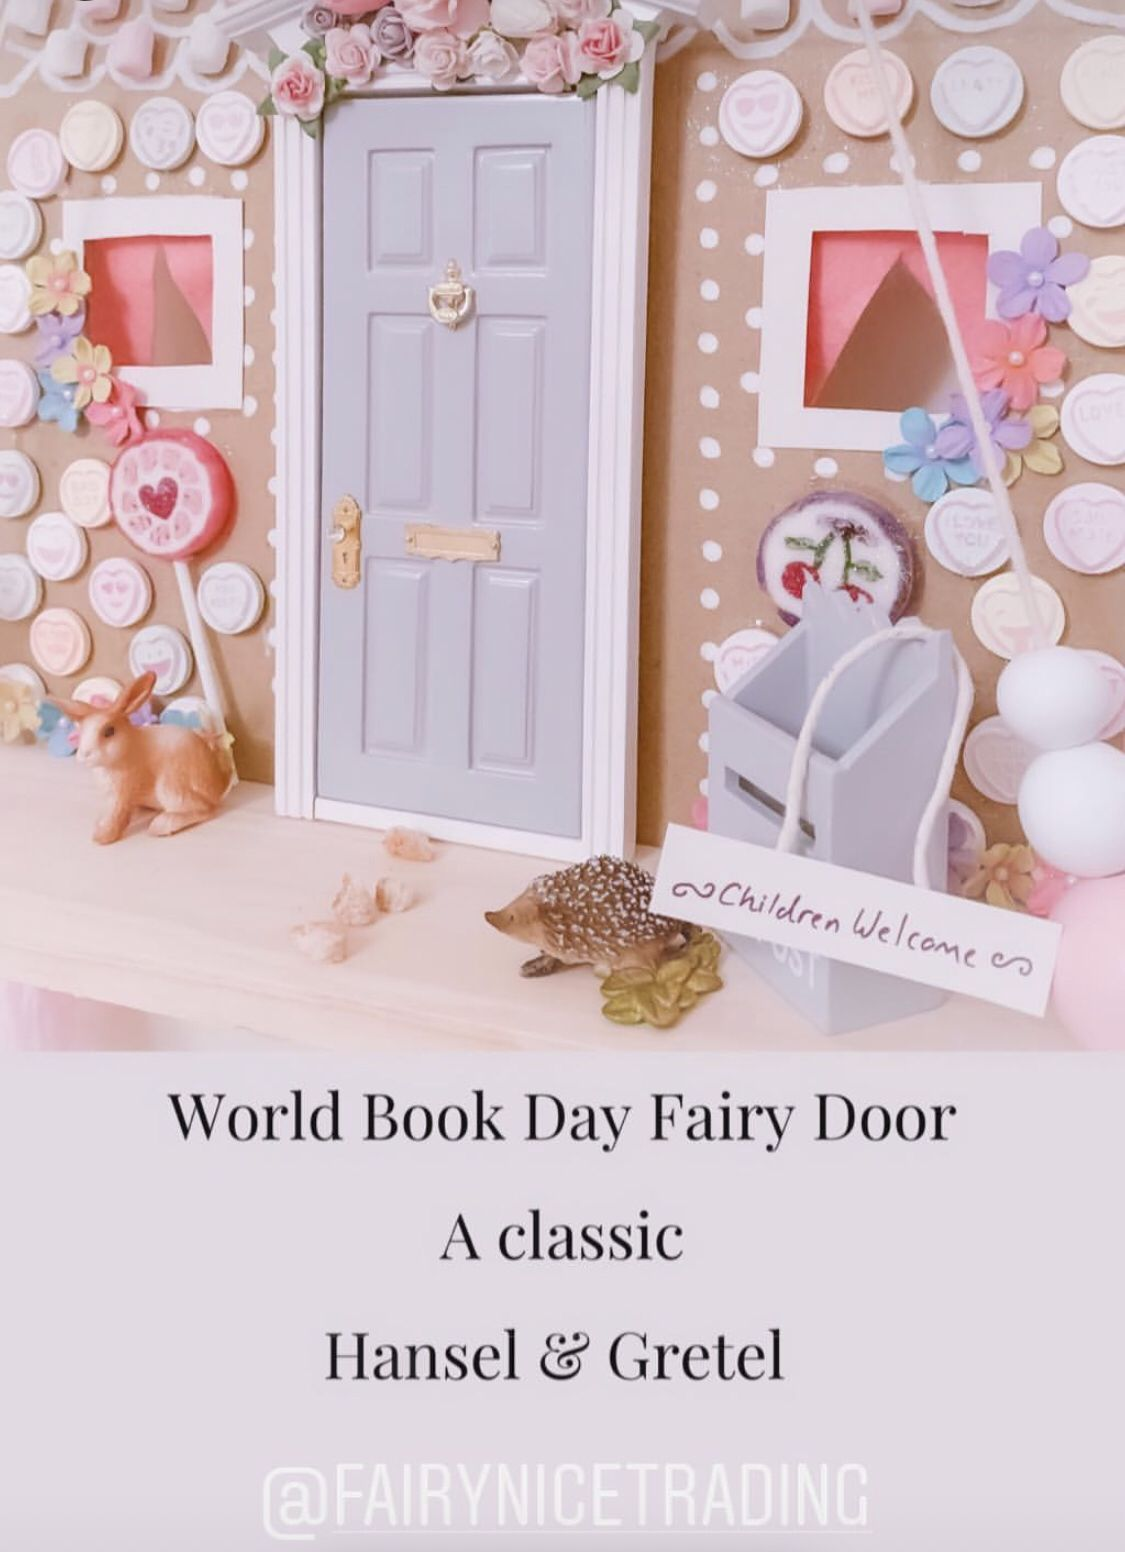 Customer Photos World Book Day Fairy Door Accessories Fairy Doors Customer Photos